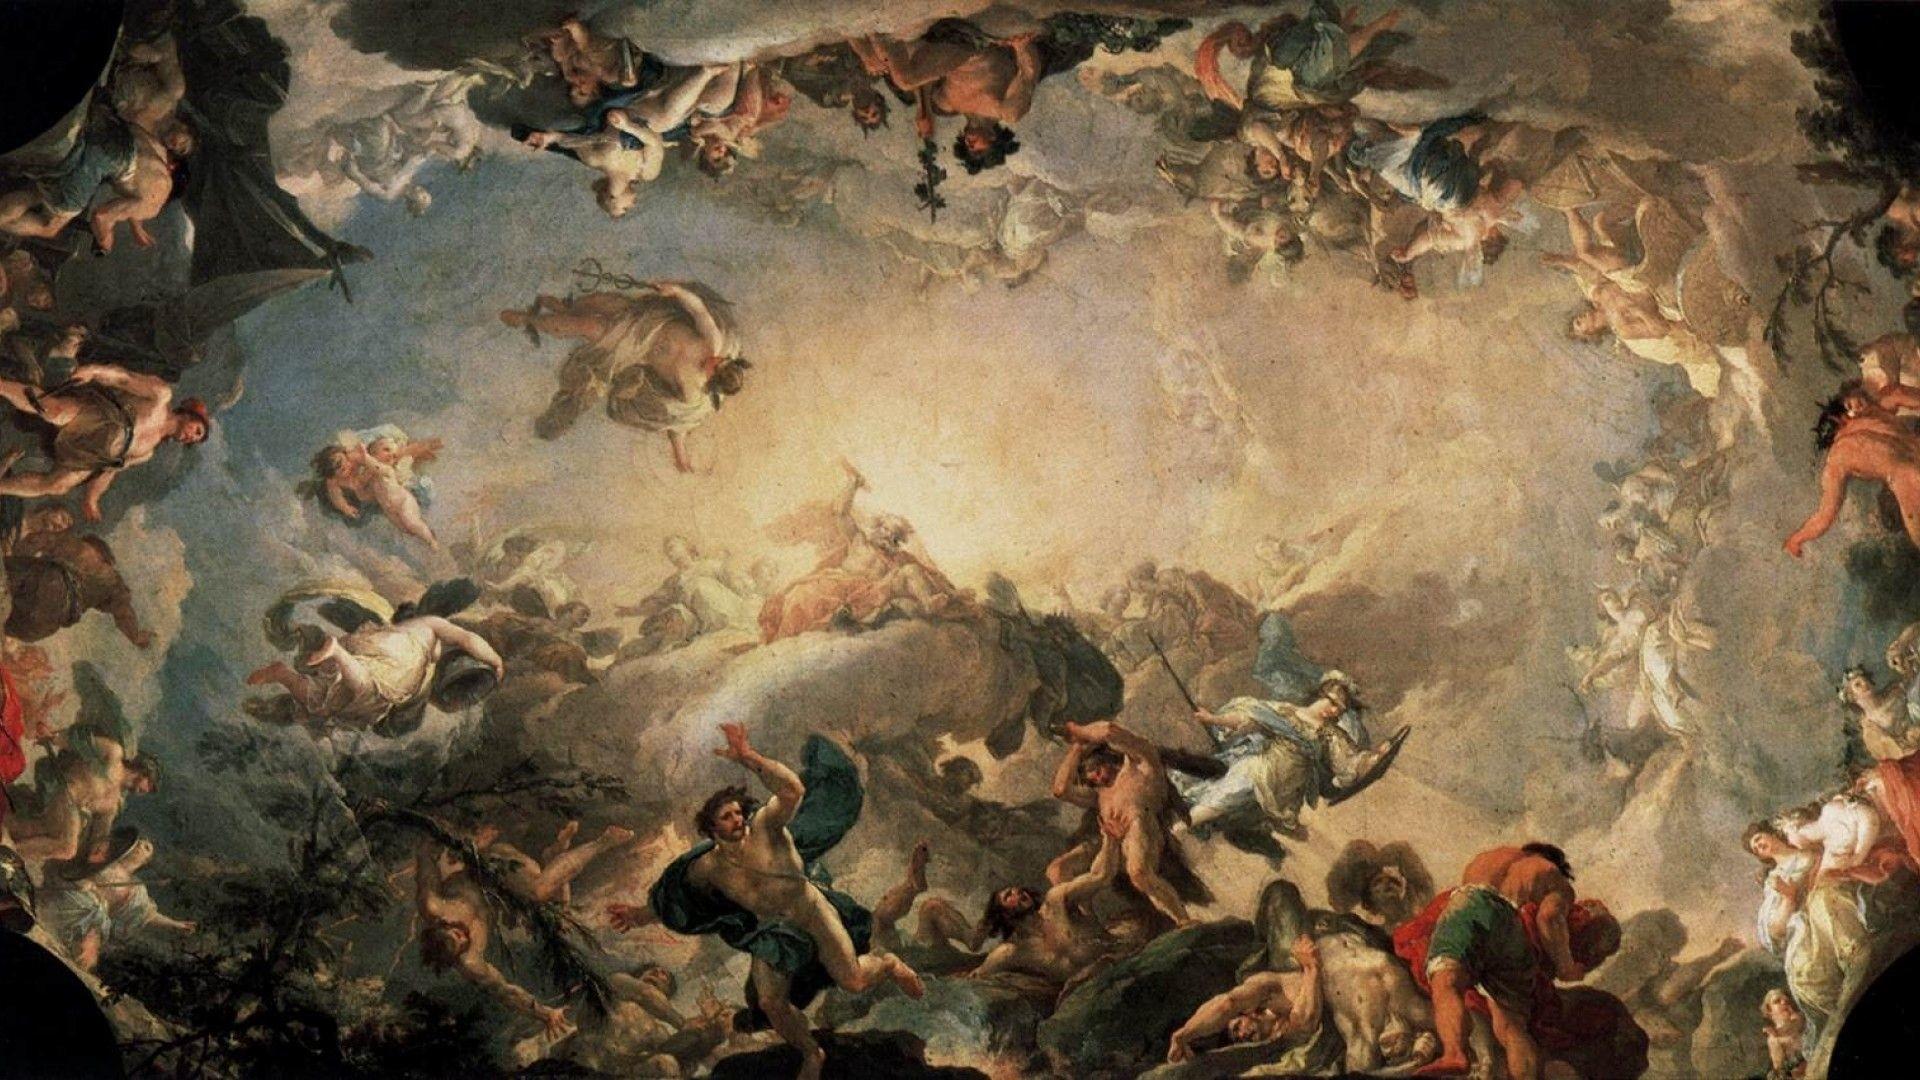 mythology wallpaper 68 images